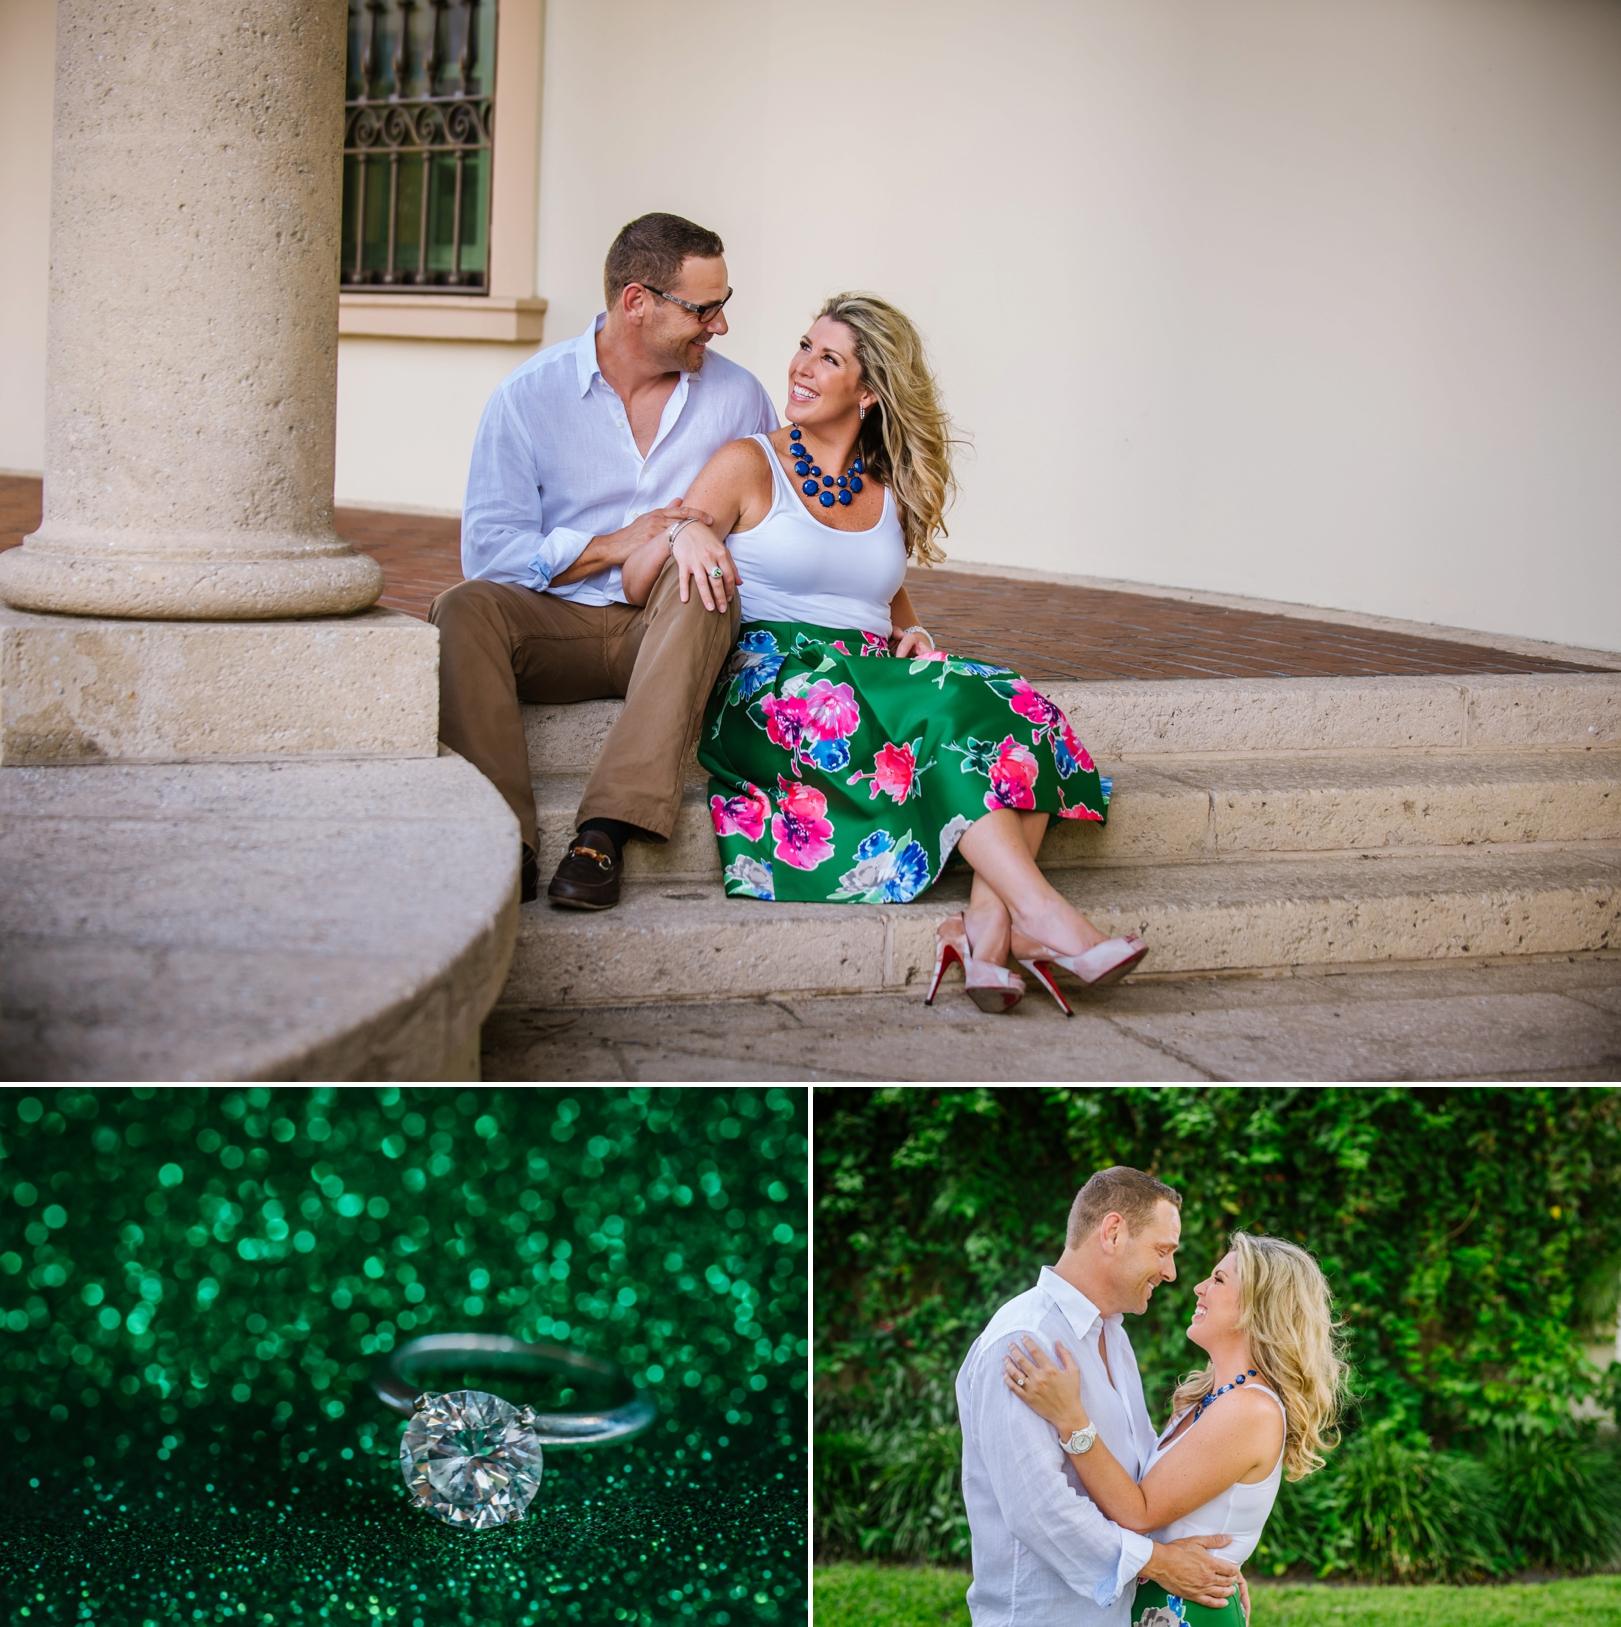 tampa-wedding-photographer-stylish-engagement_0001.jpg